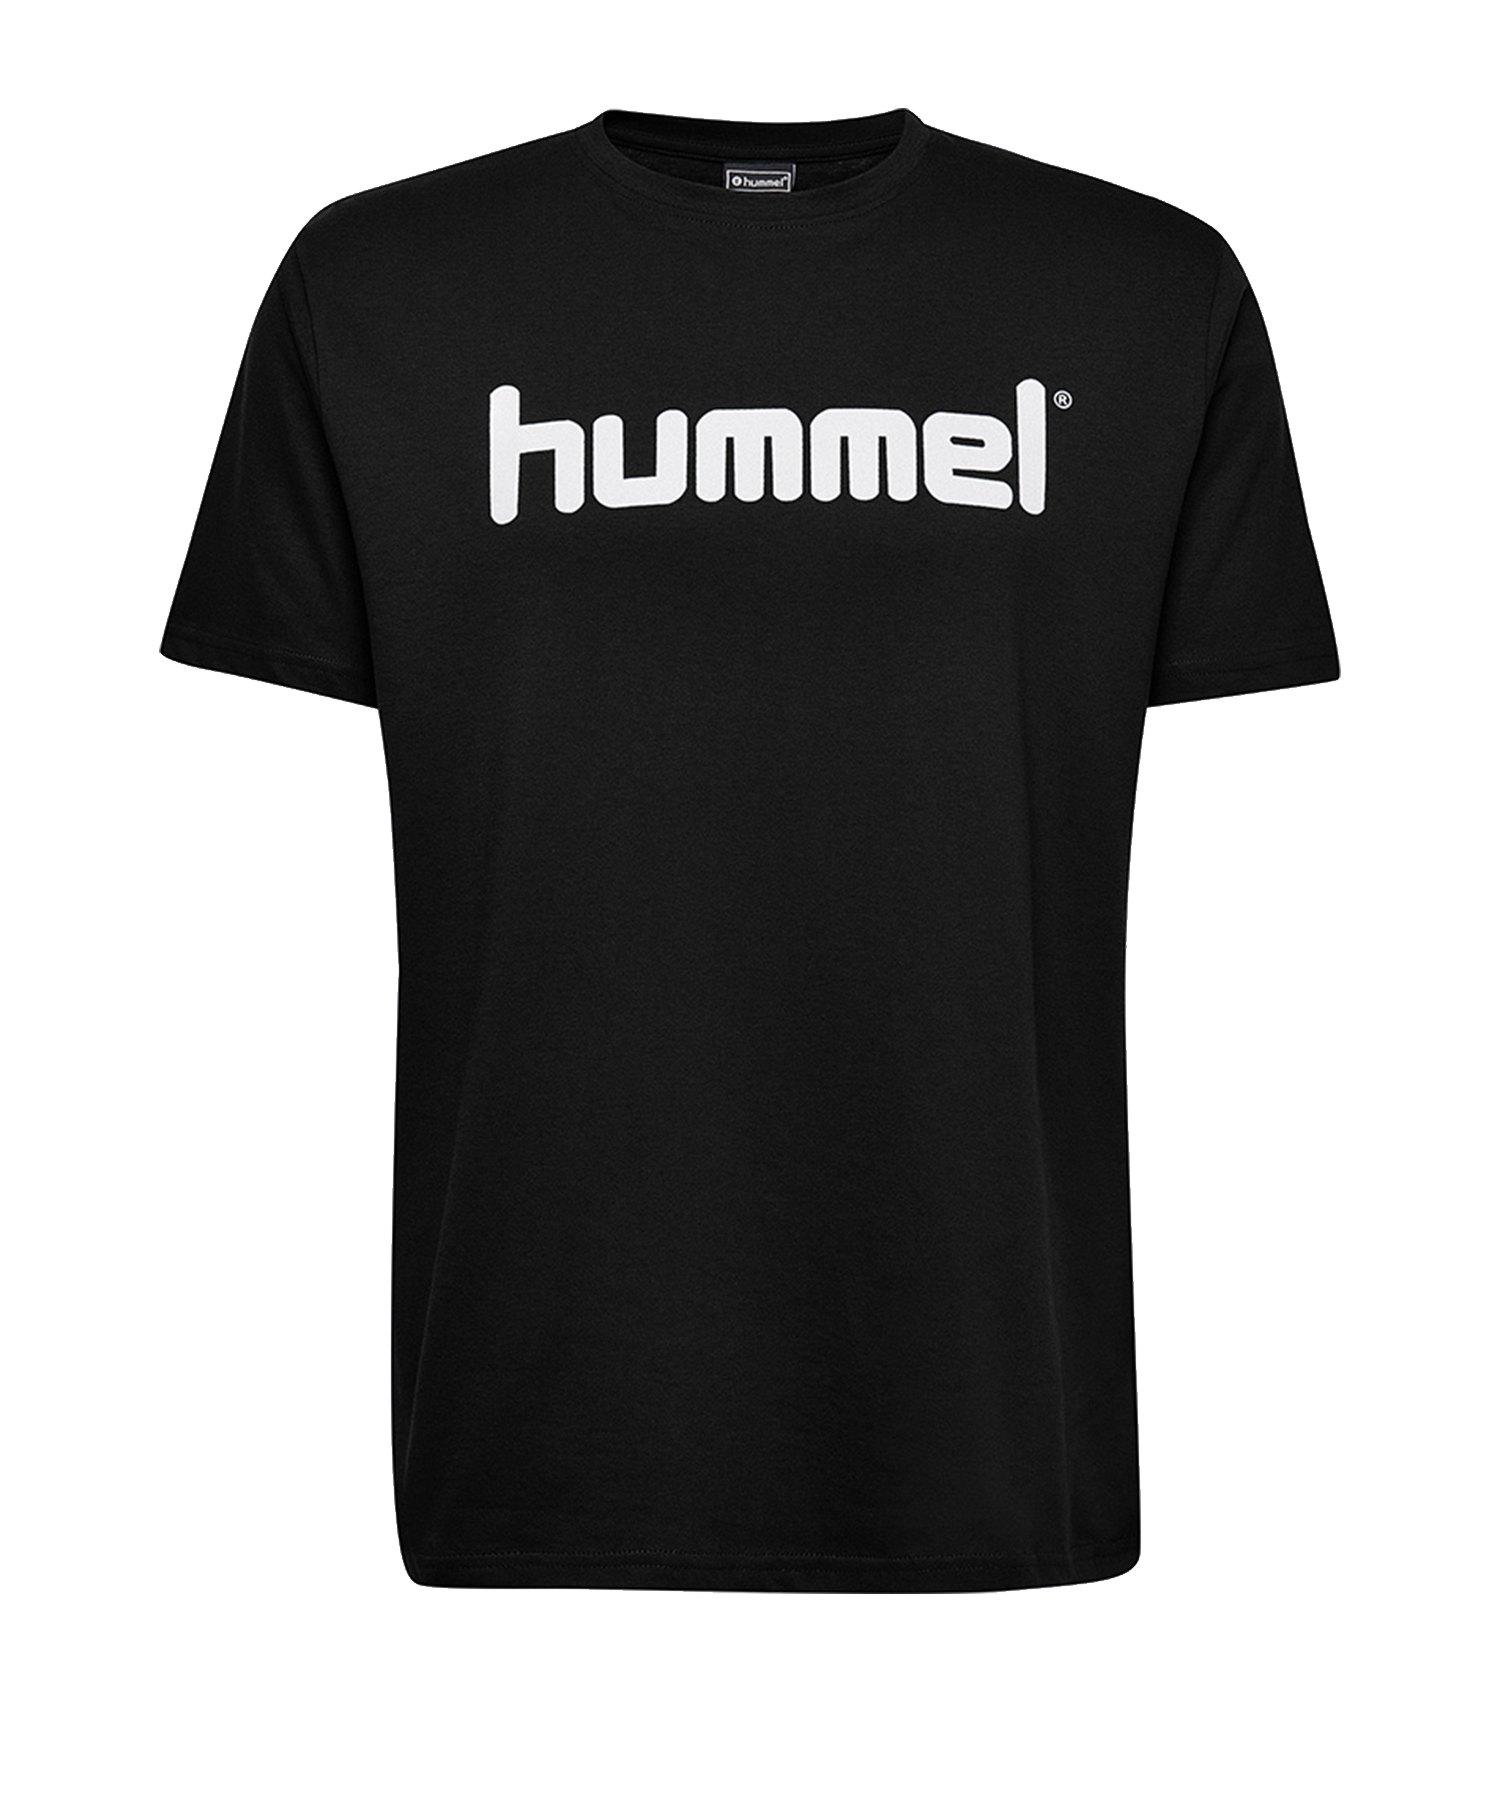 Hummel Cotton T-Shirt Logo Schwarz F2001 - Schwarz